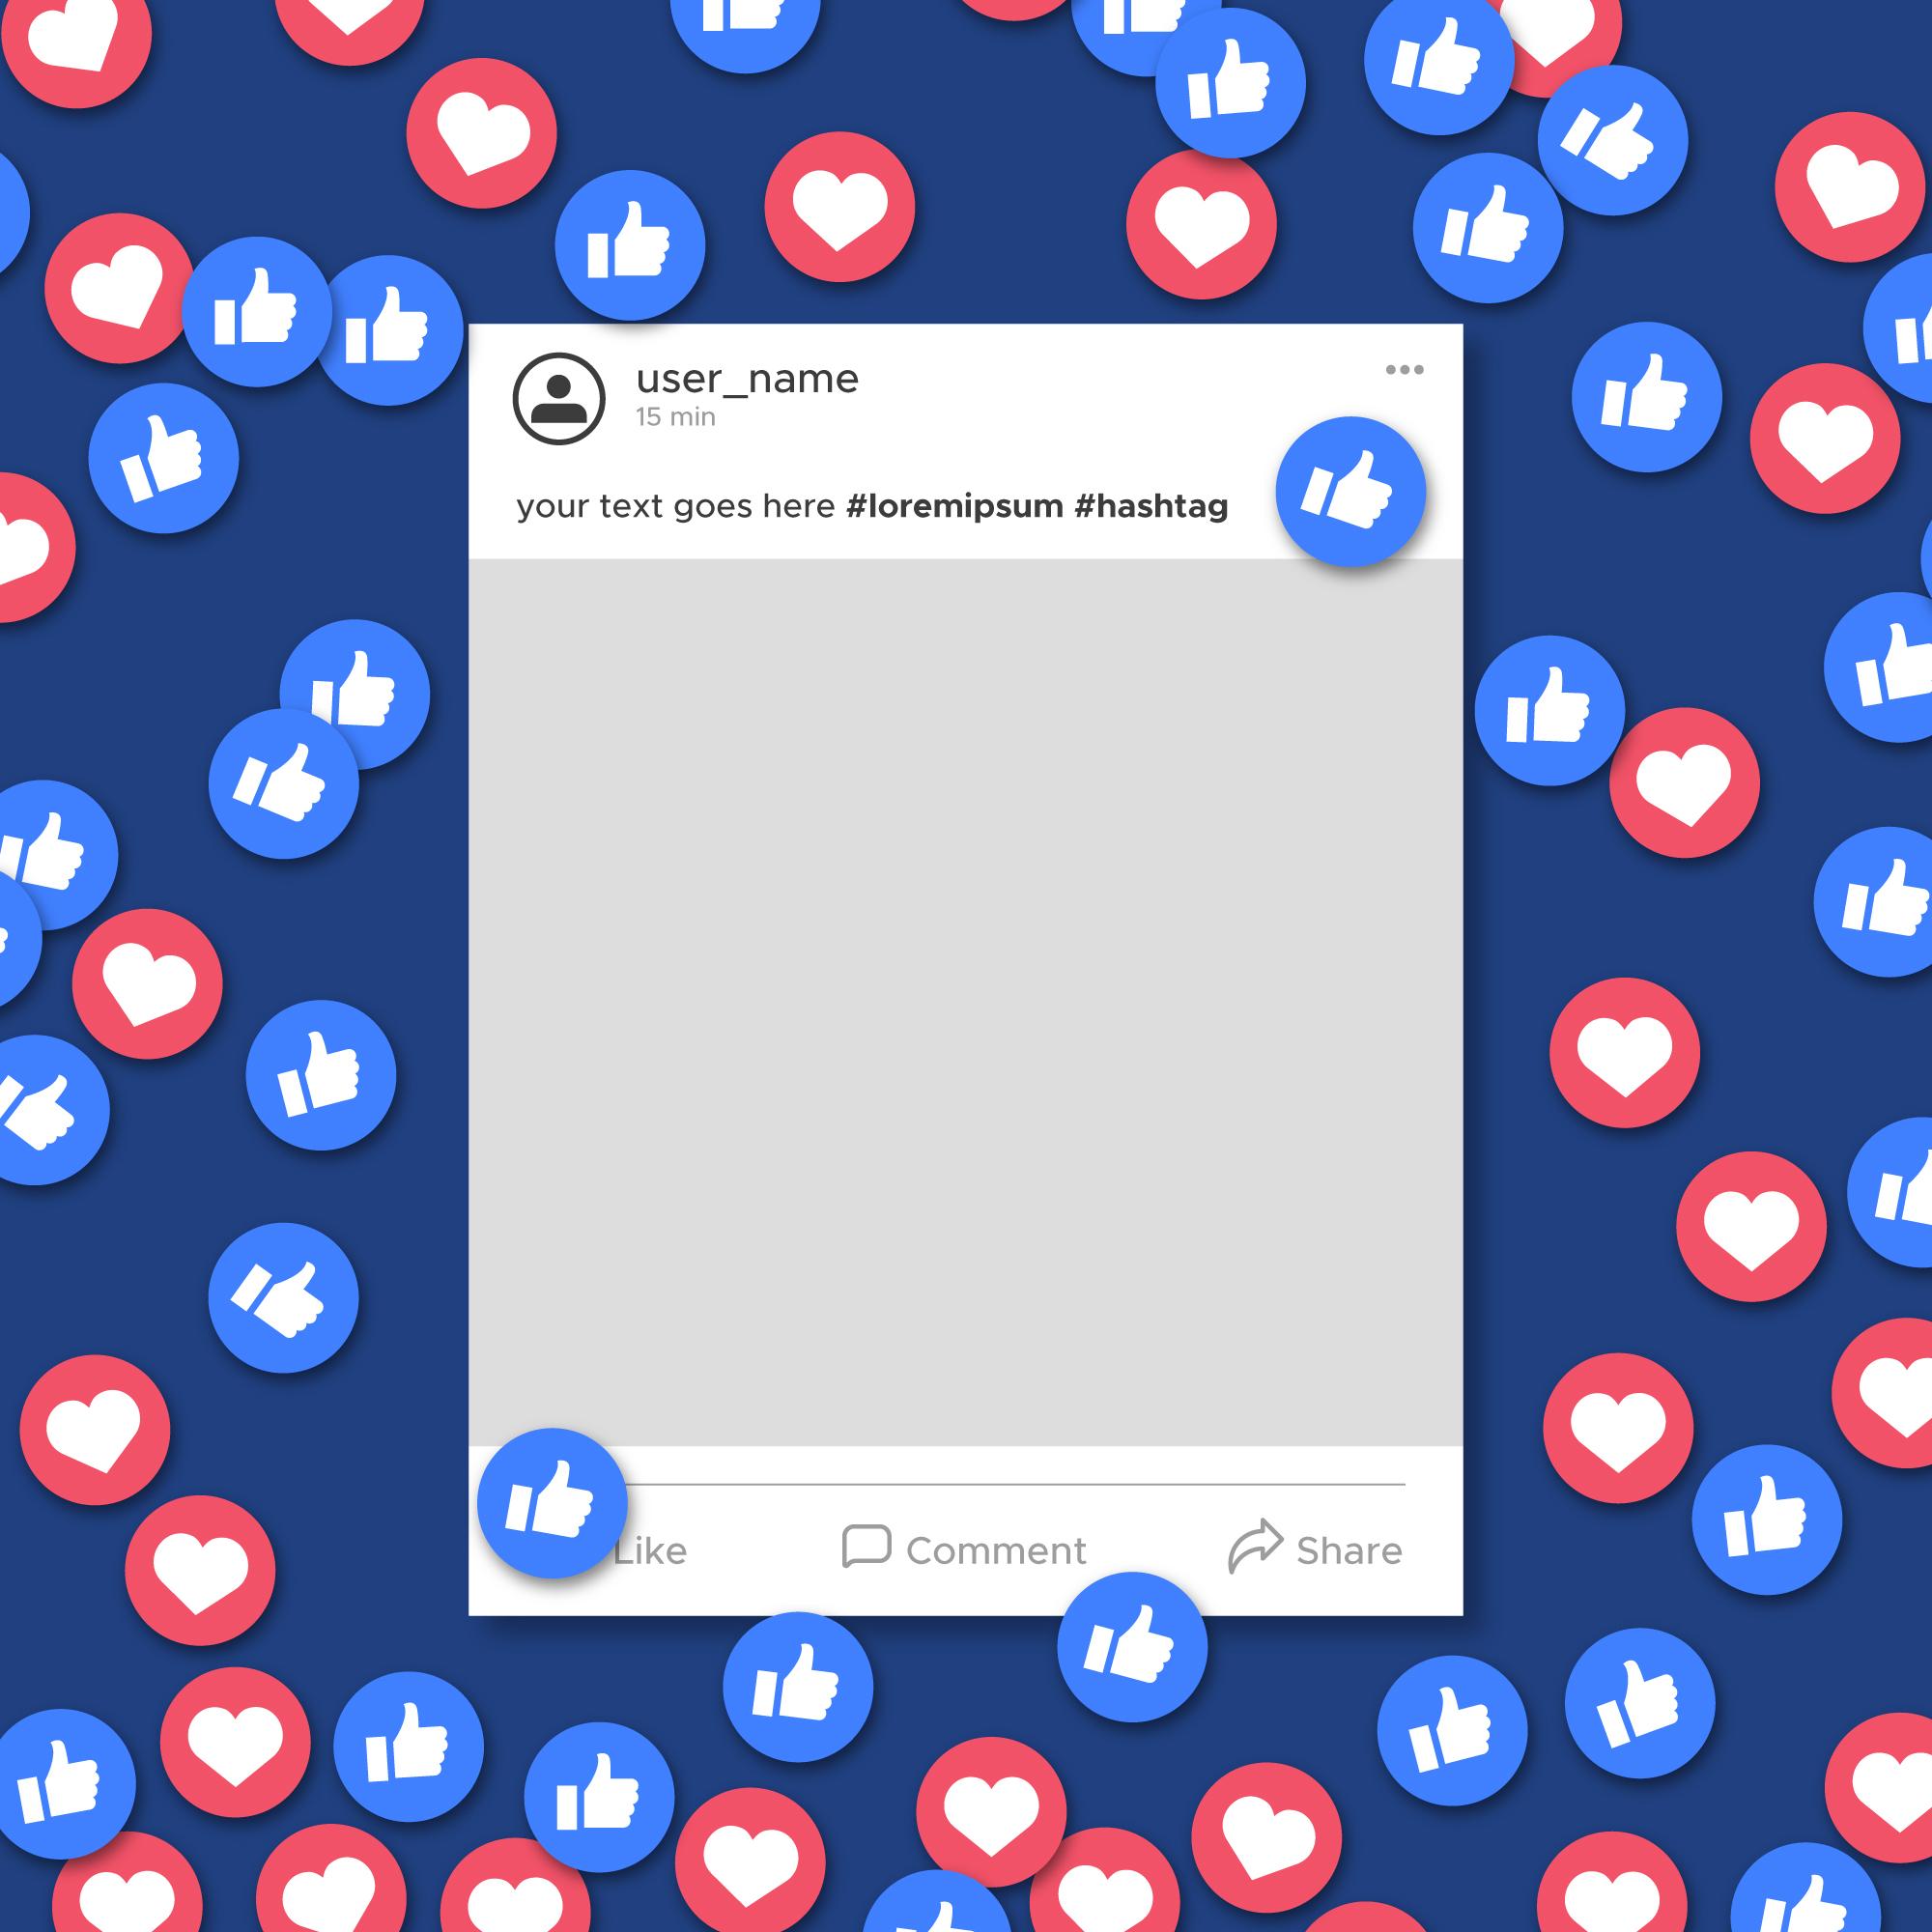 cách tăng like facebook đơn giản nhất halo media